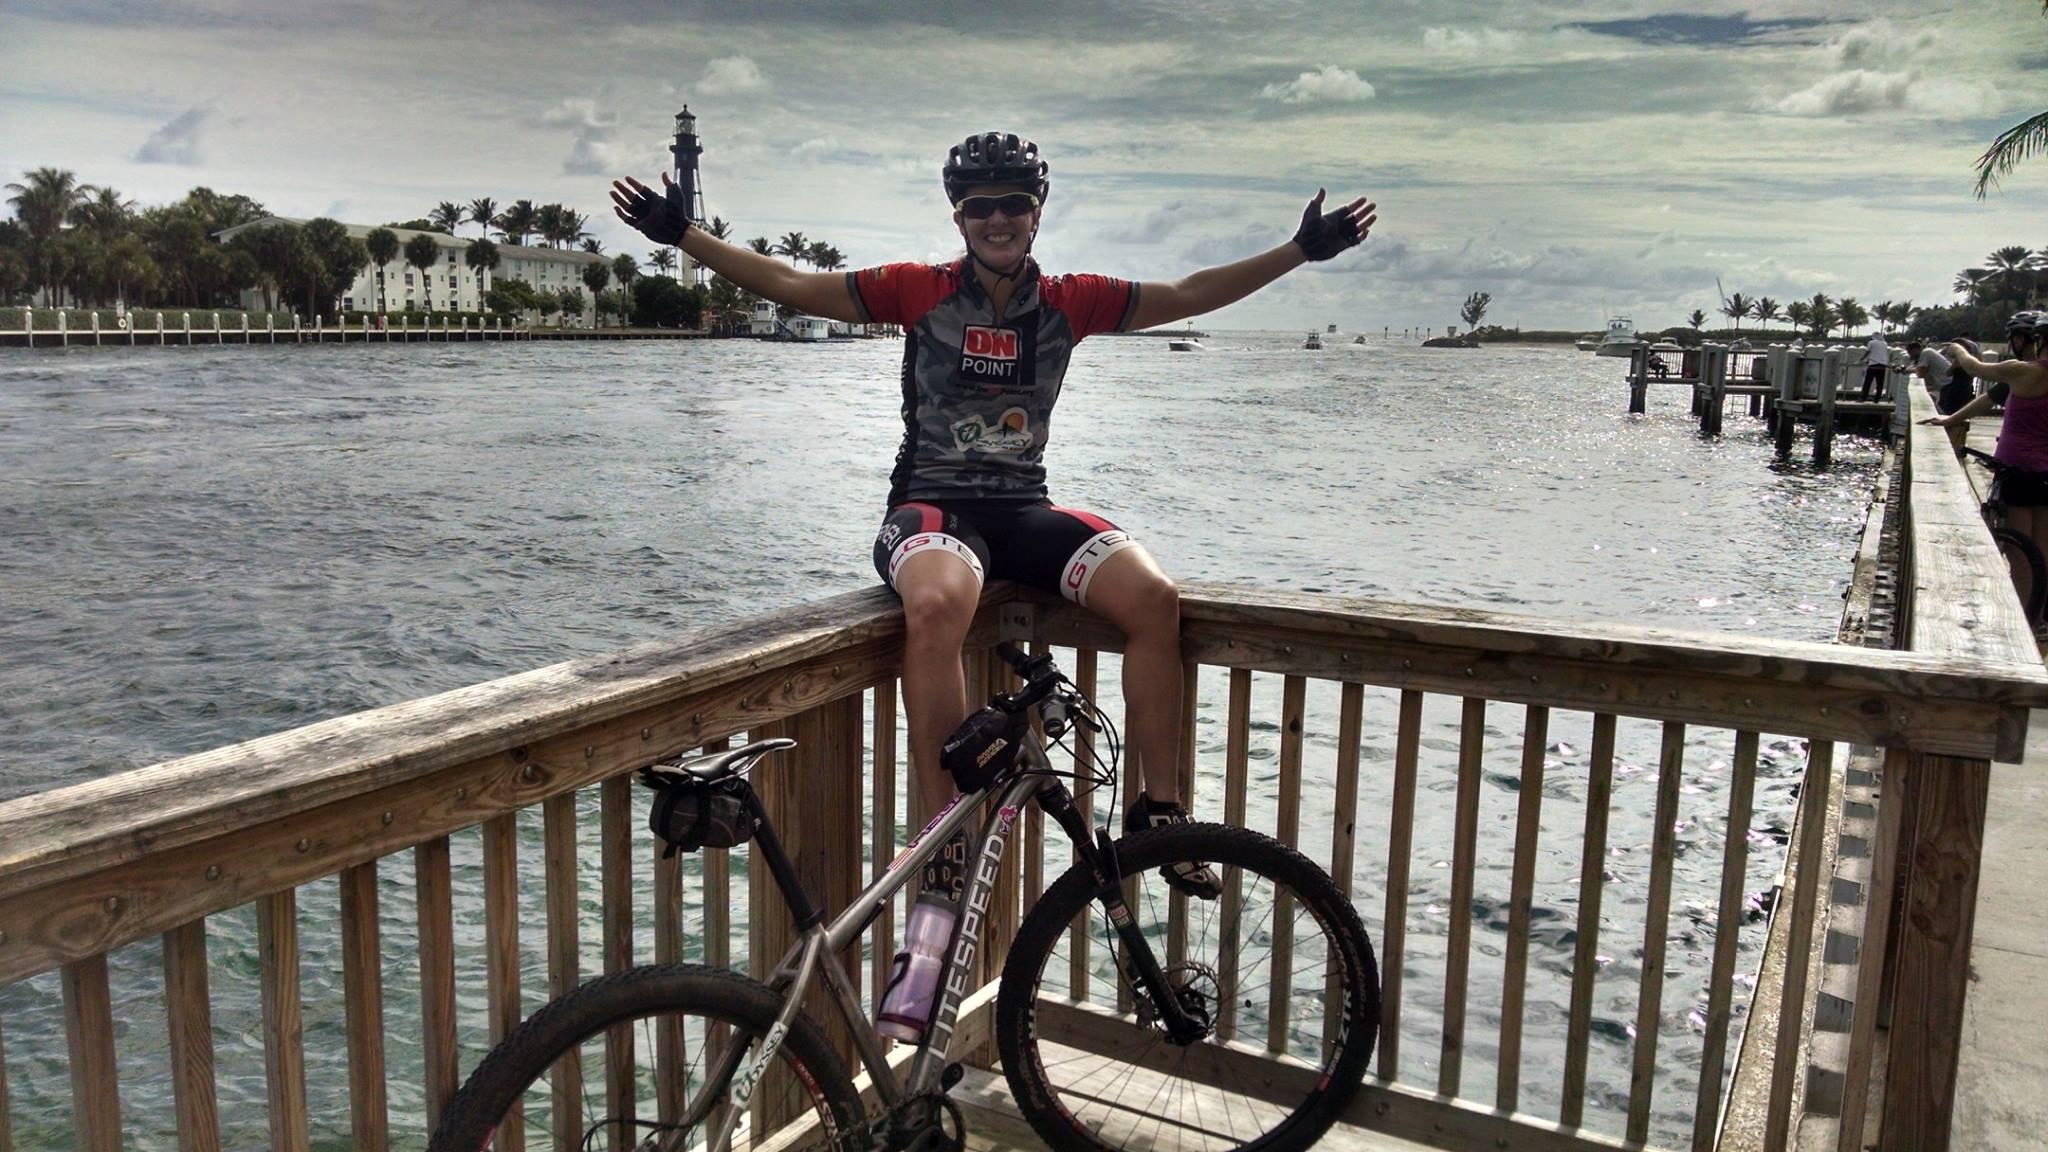 I Love Cycling!